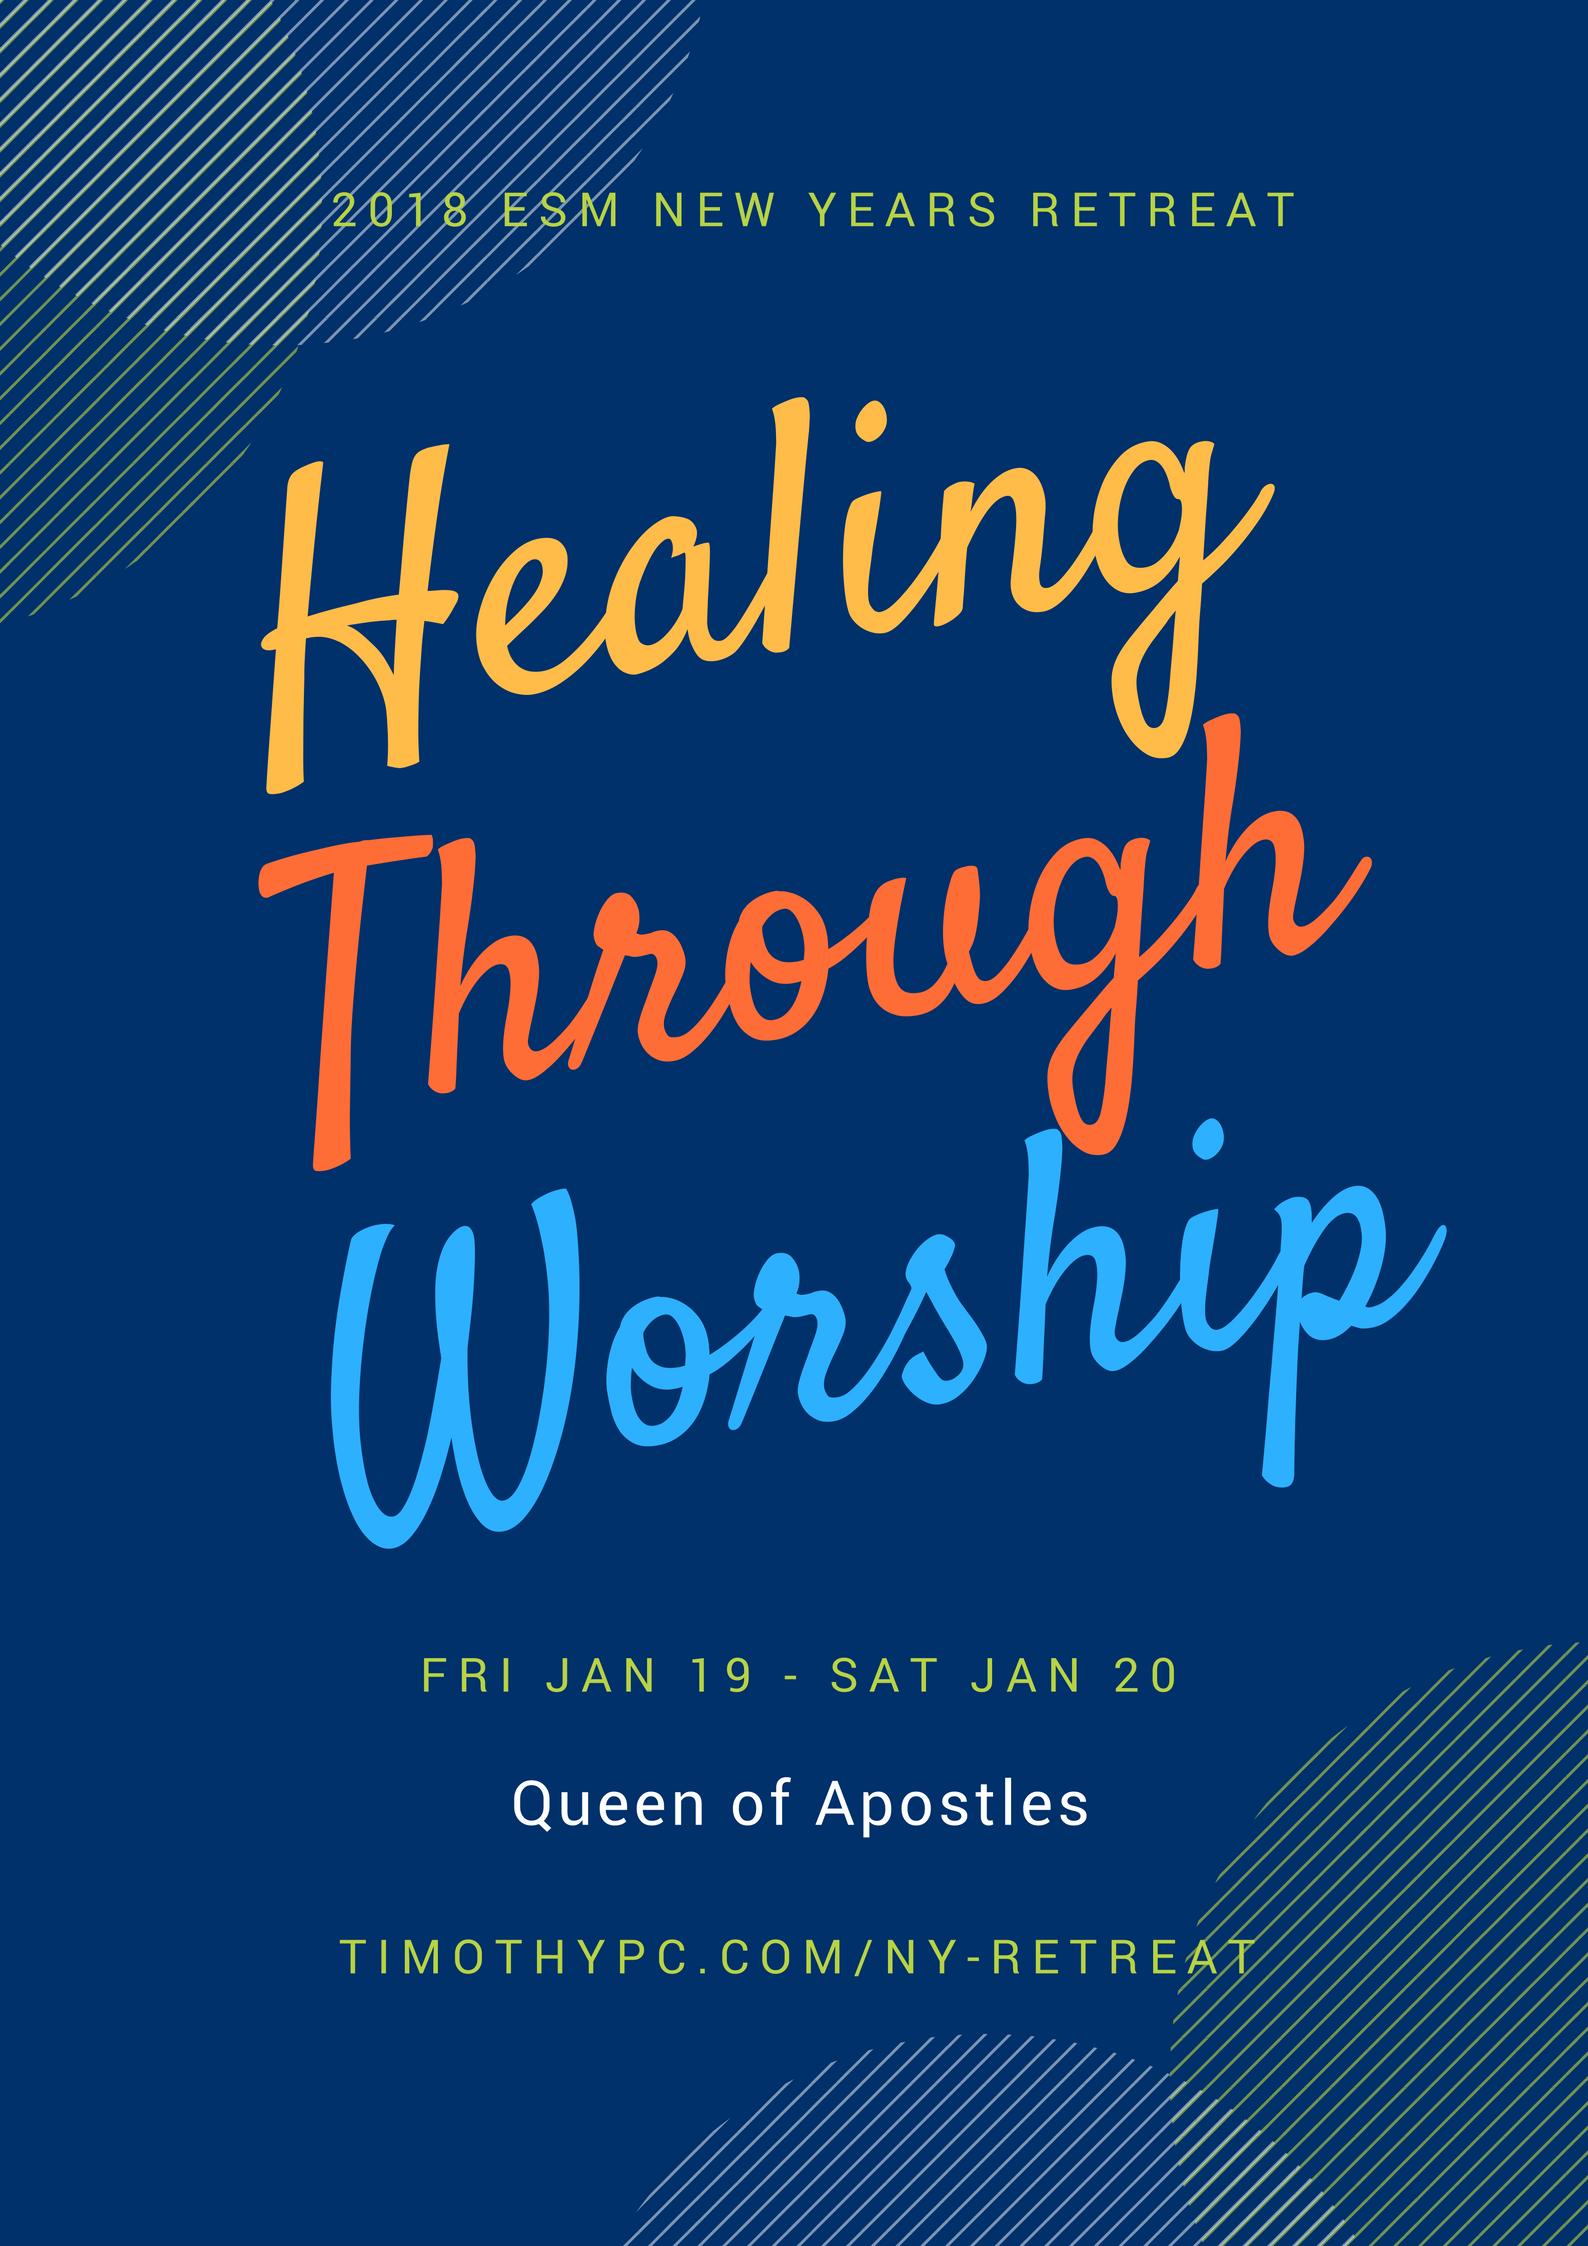 St. Timothy New Year Retreat 2018